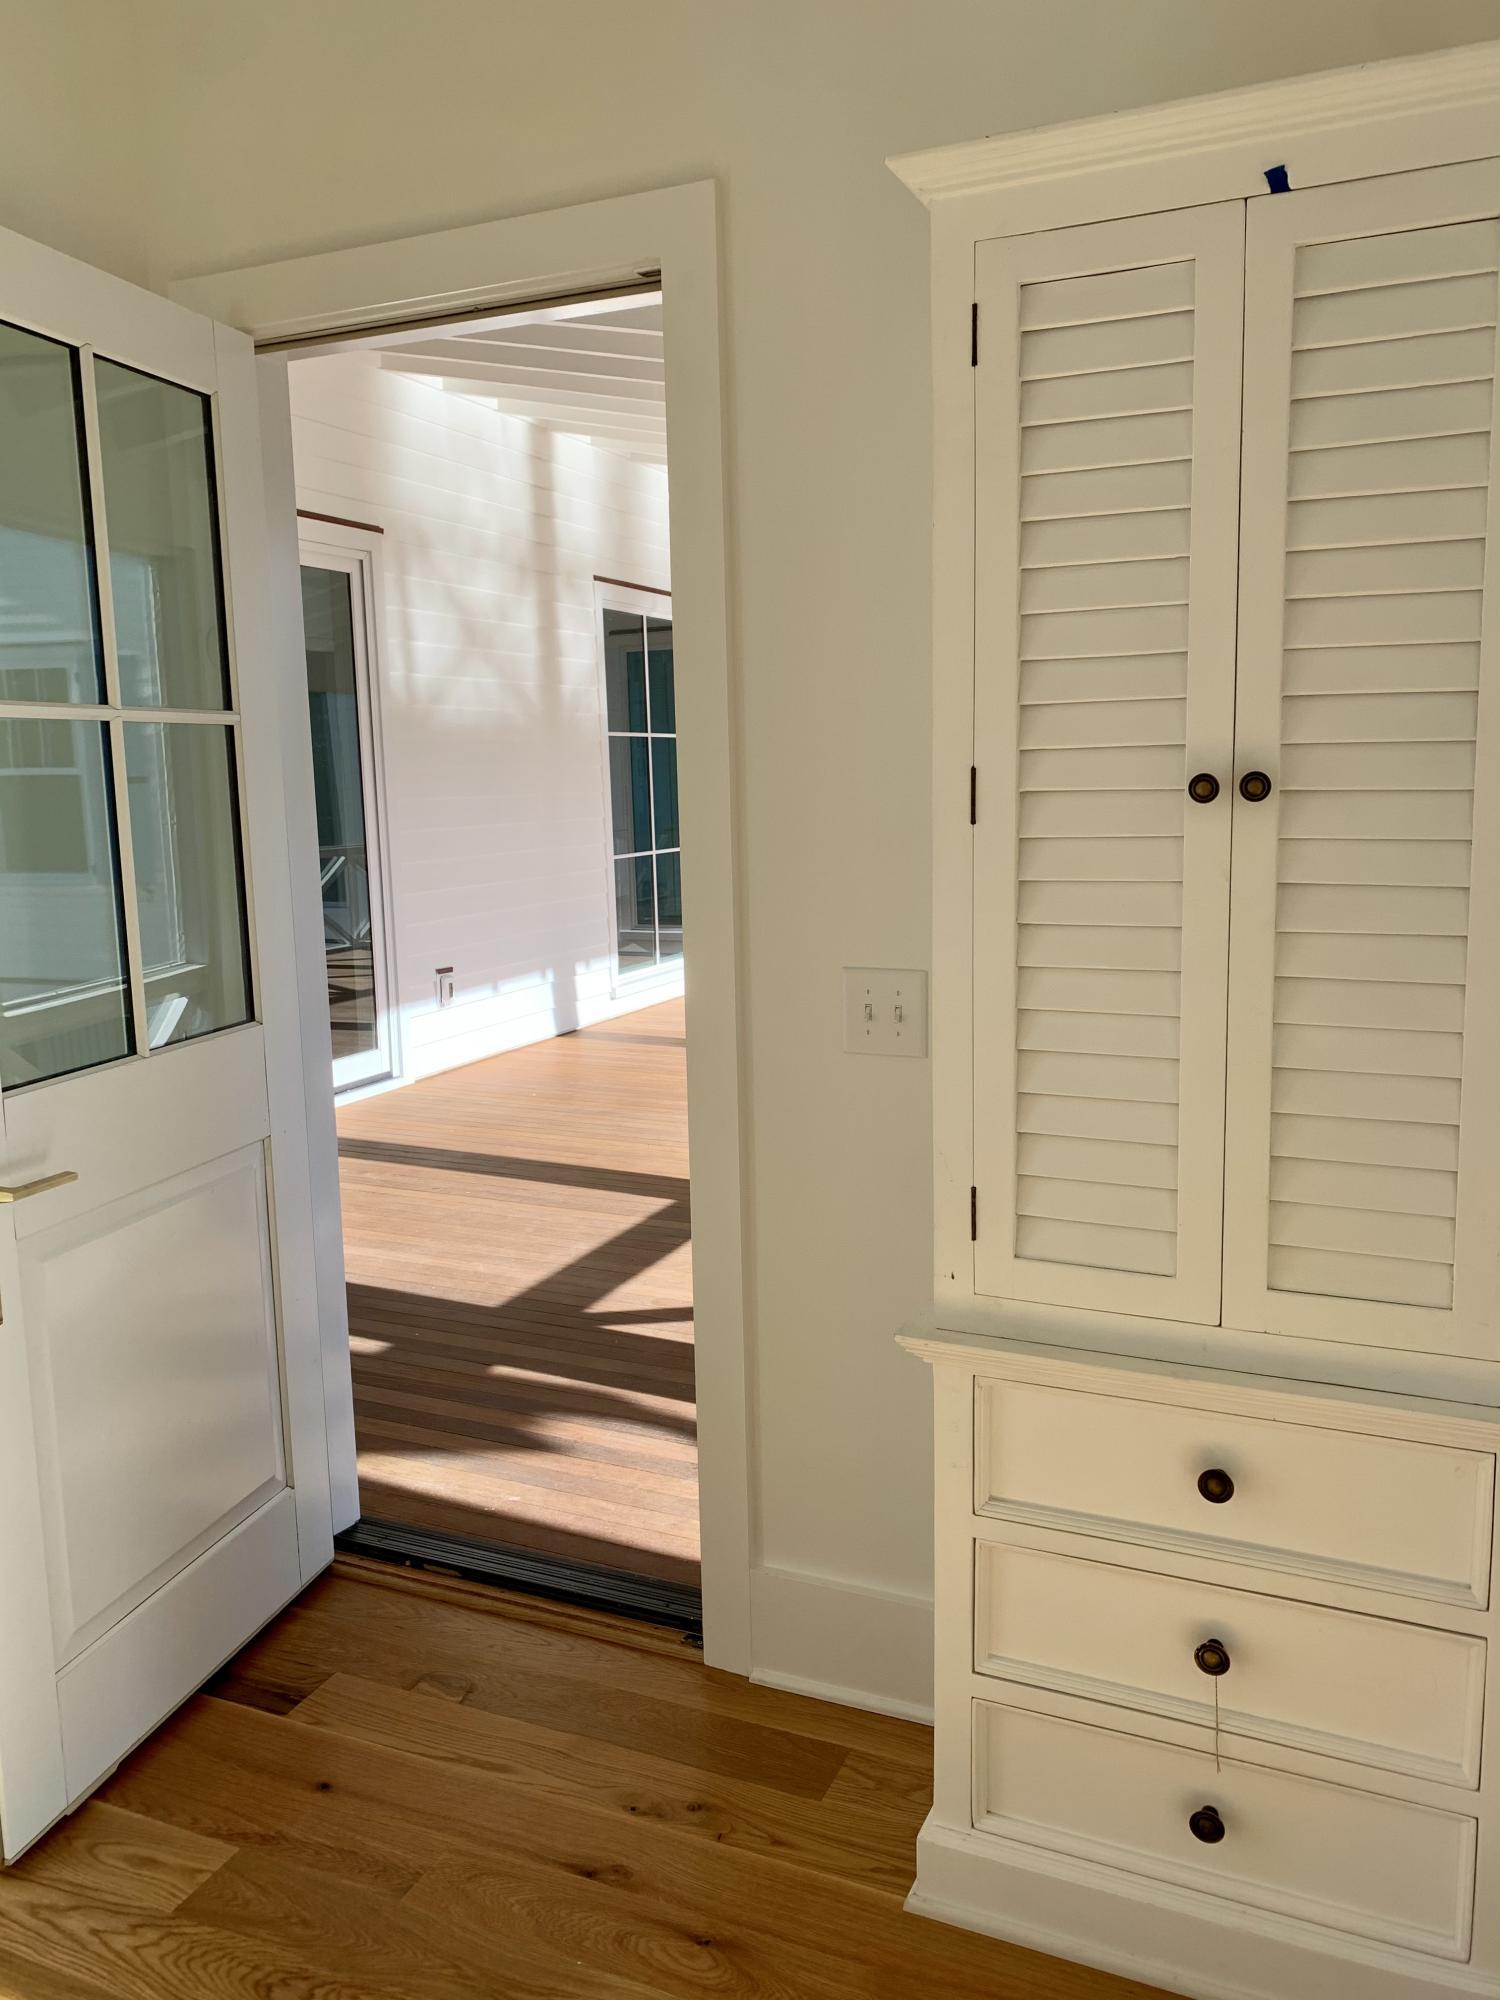 None Homes For Sale - 3003 Middle, Sullivans Island, SC - 20